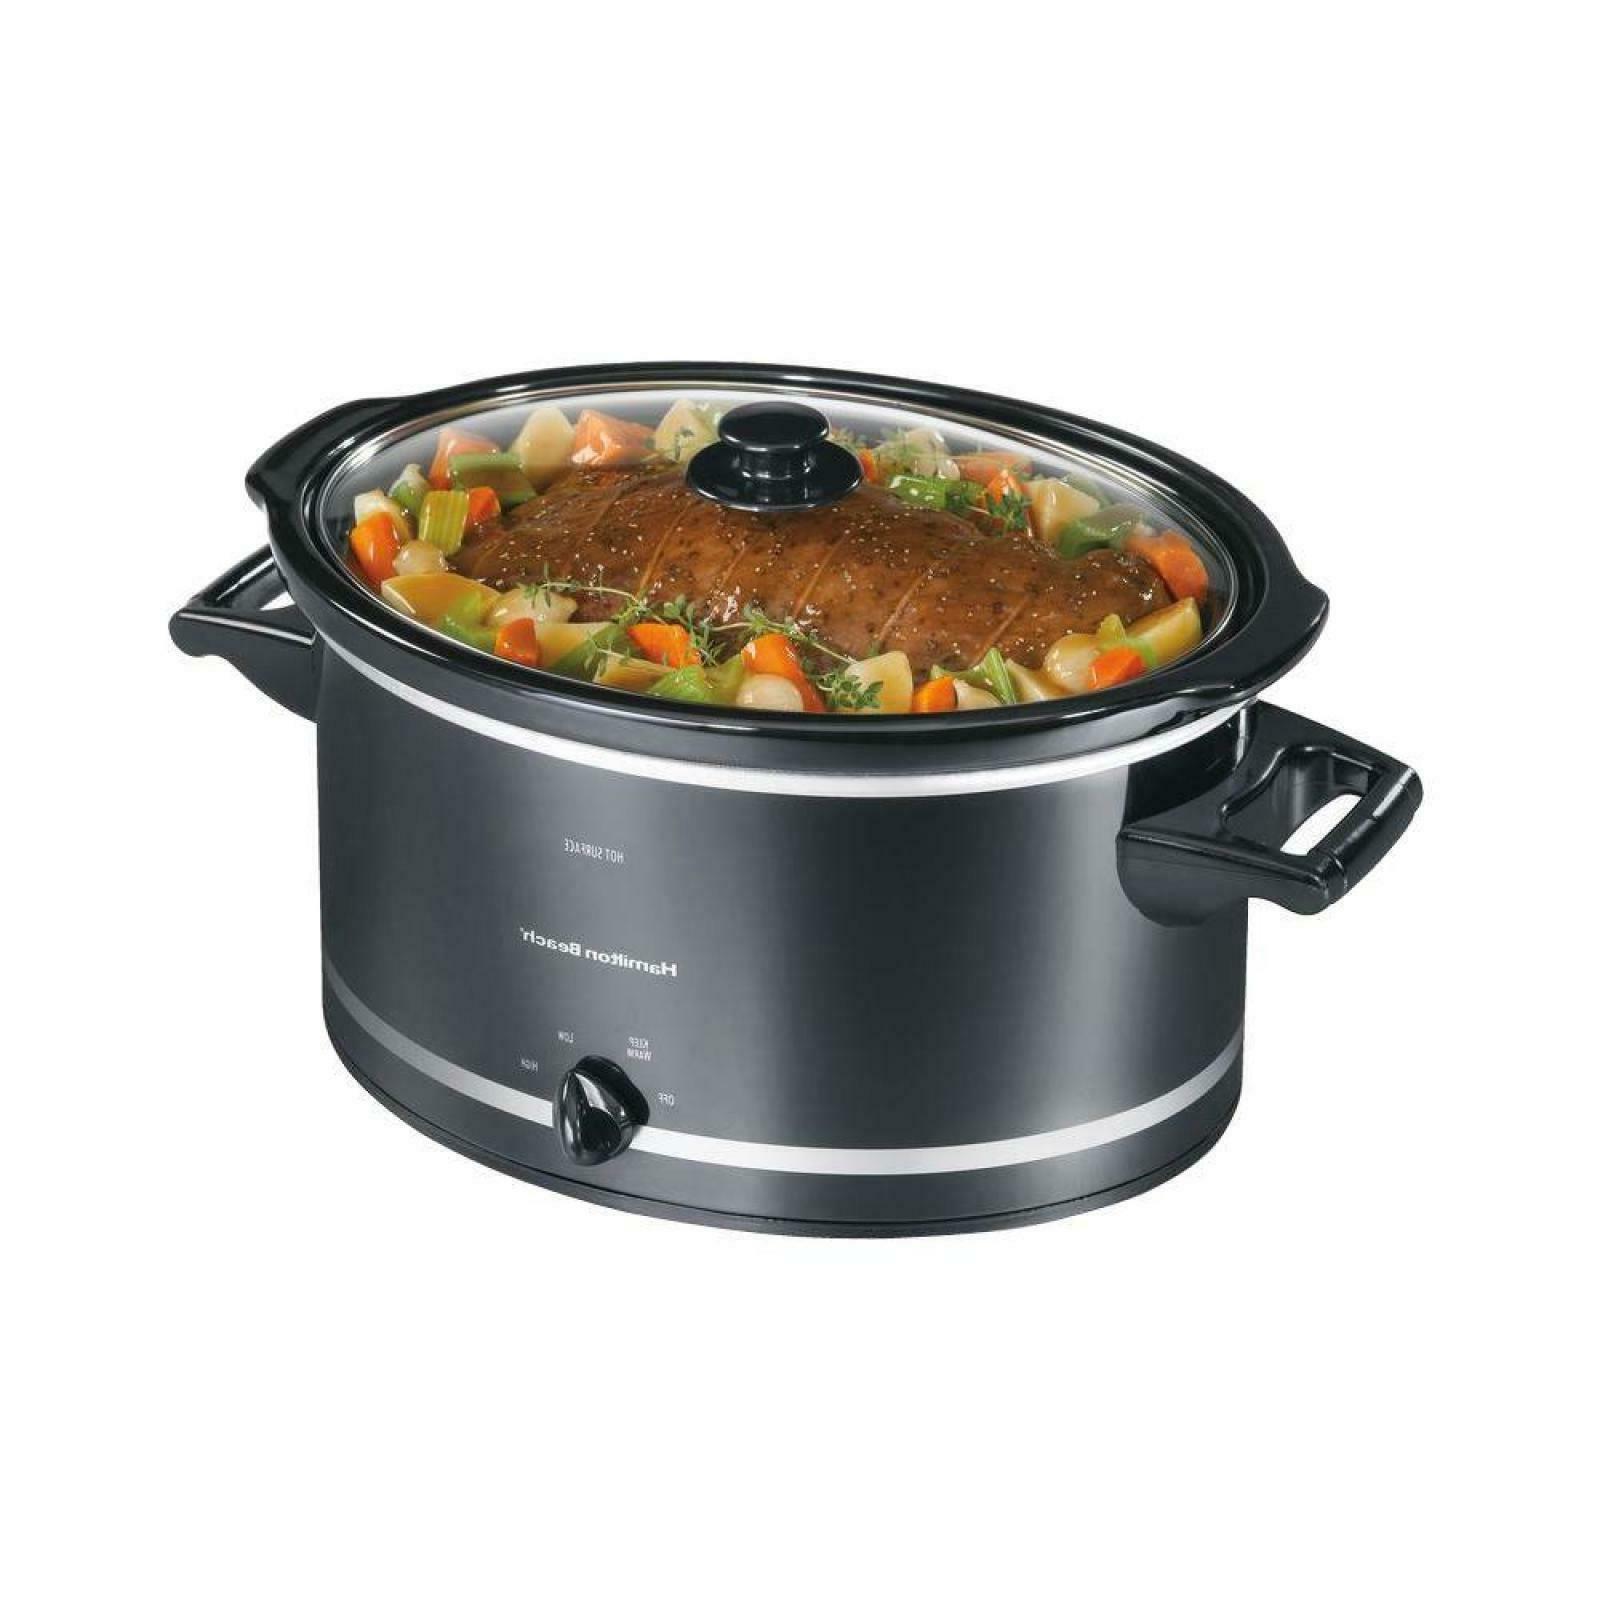 8 quart qt roast slow cooker crock